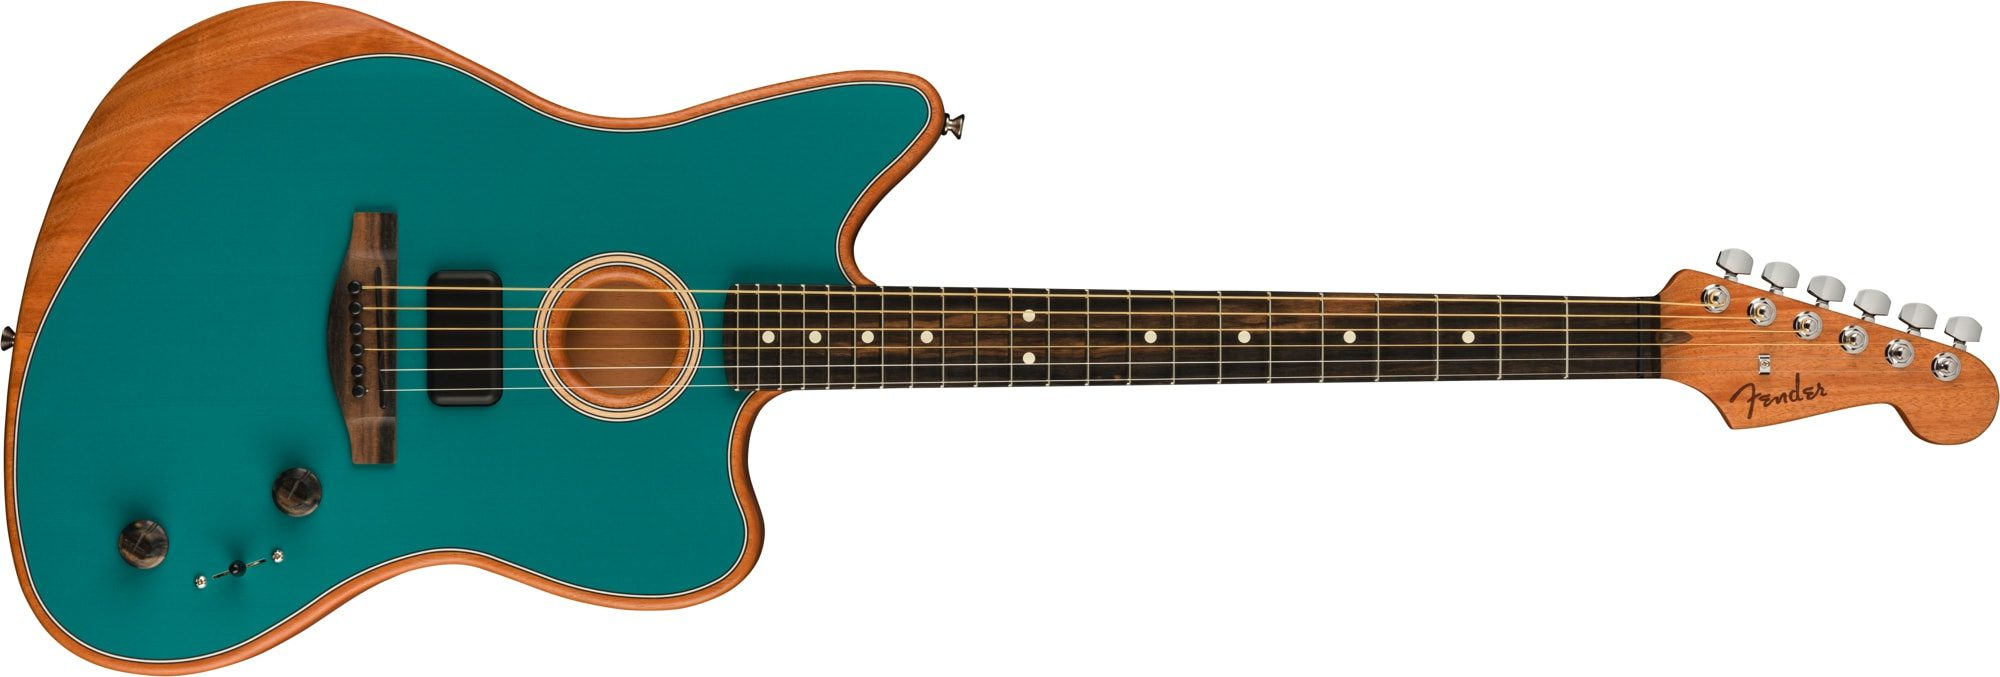 Fender Acoustasonic Jazzmaster in Ocean Turquoise